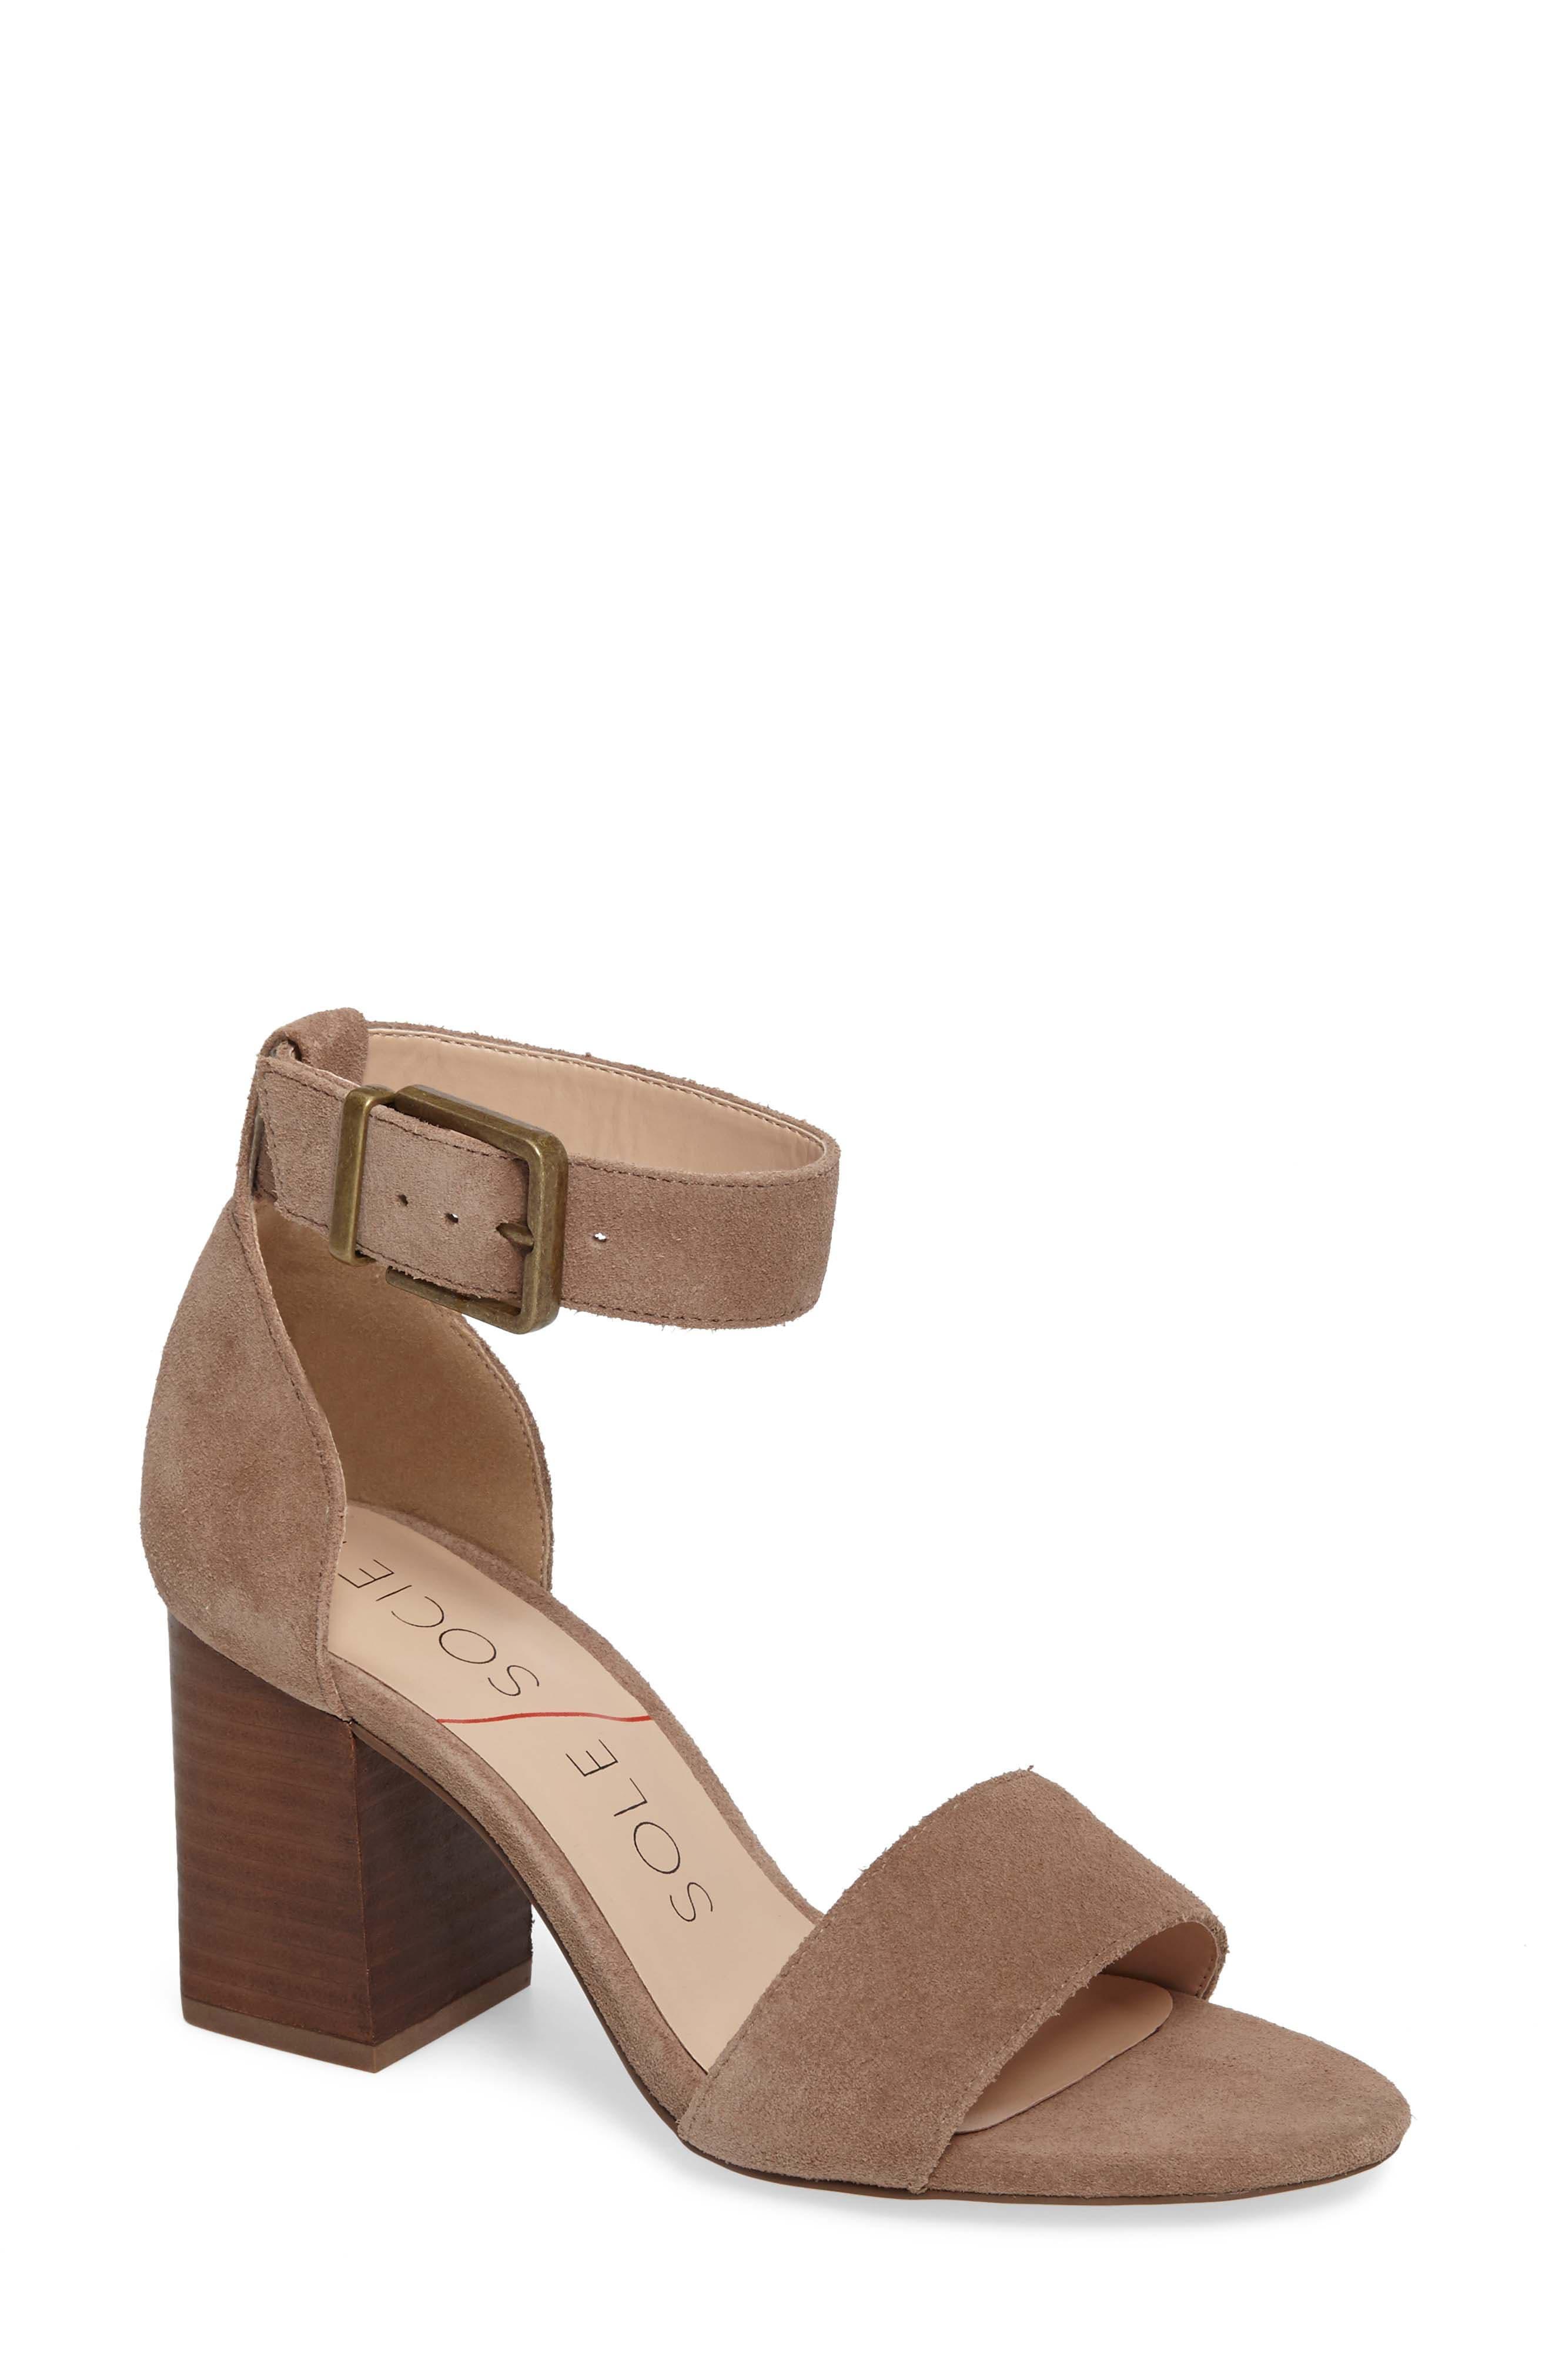 Image of Sole Society Montana Sandal